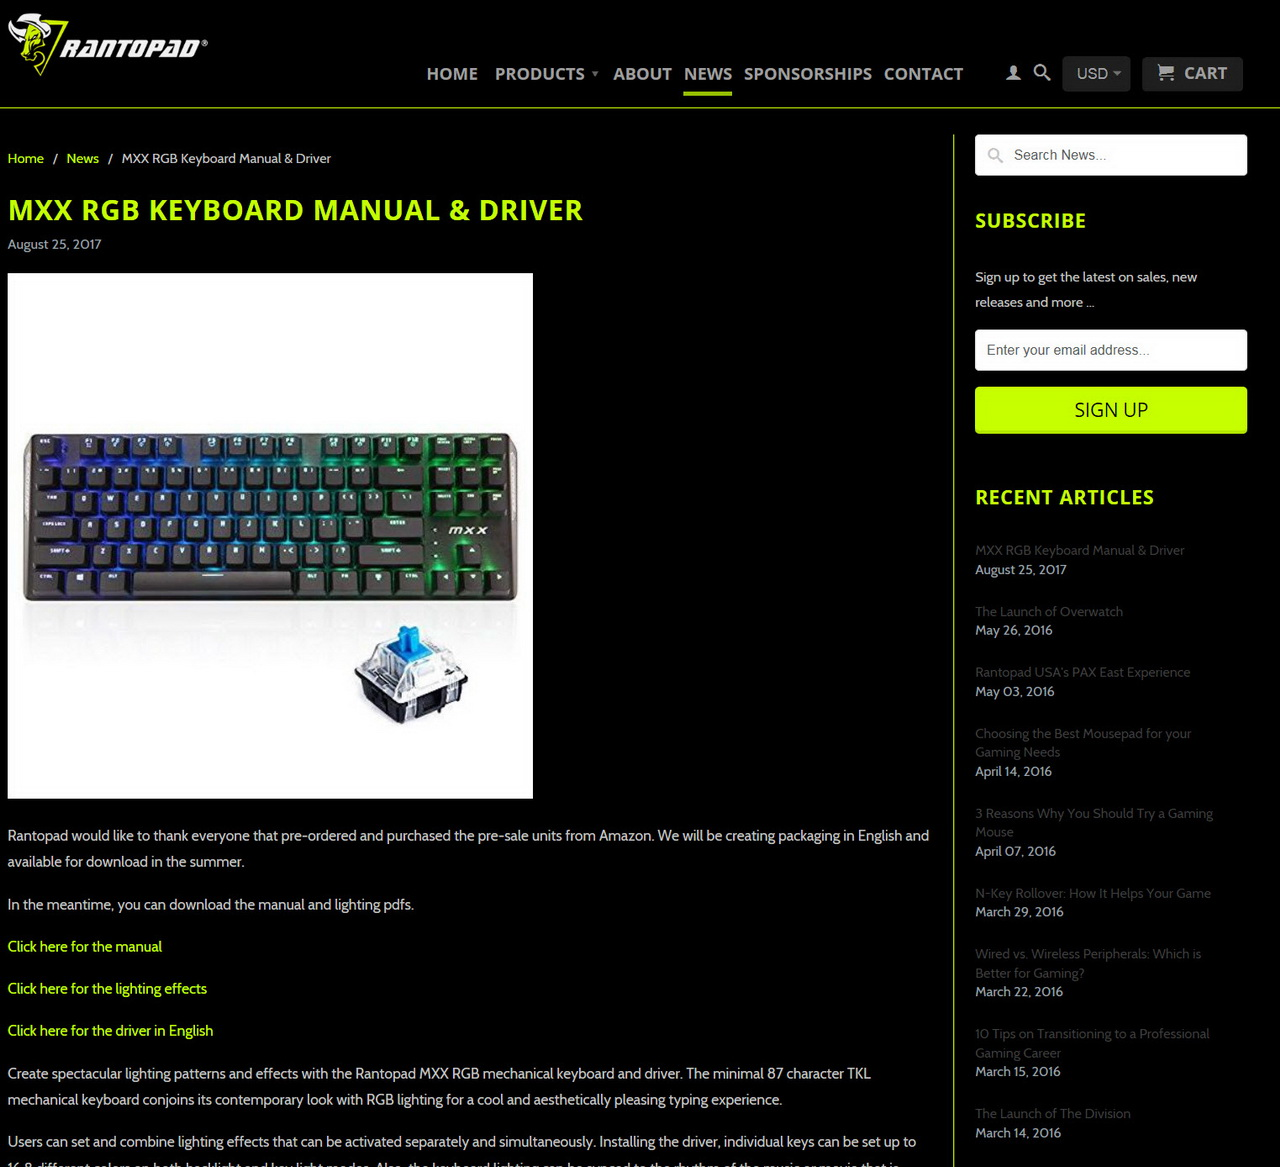 Rantopad MXX RGB Mechanical Gaming Keyboard Review